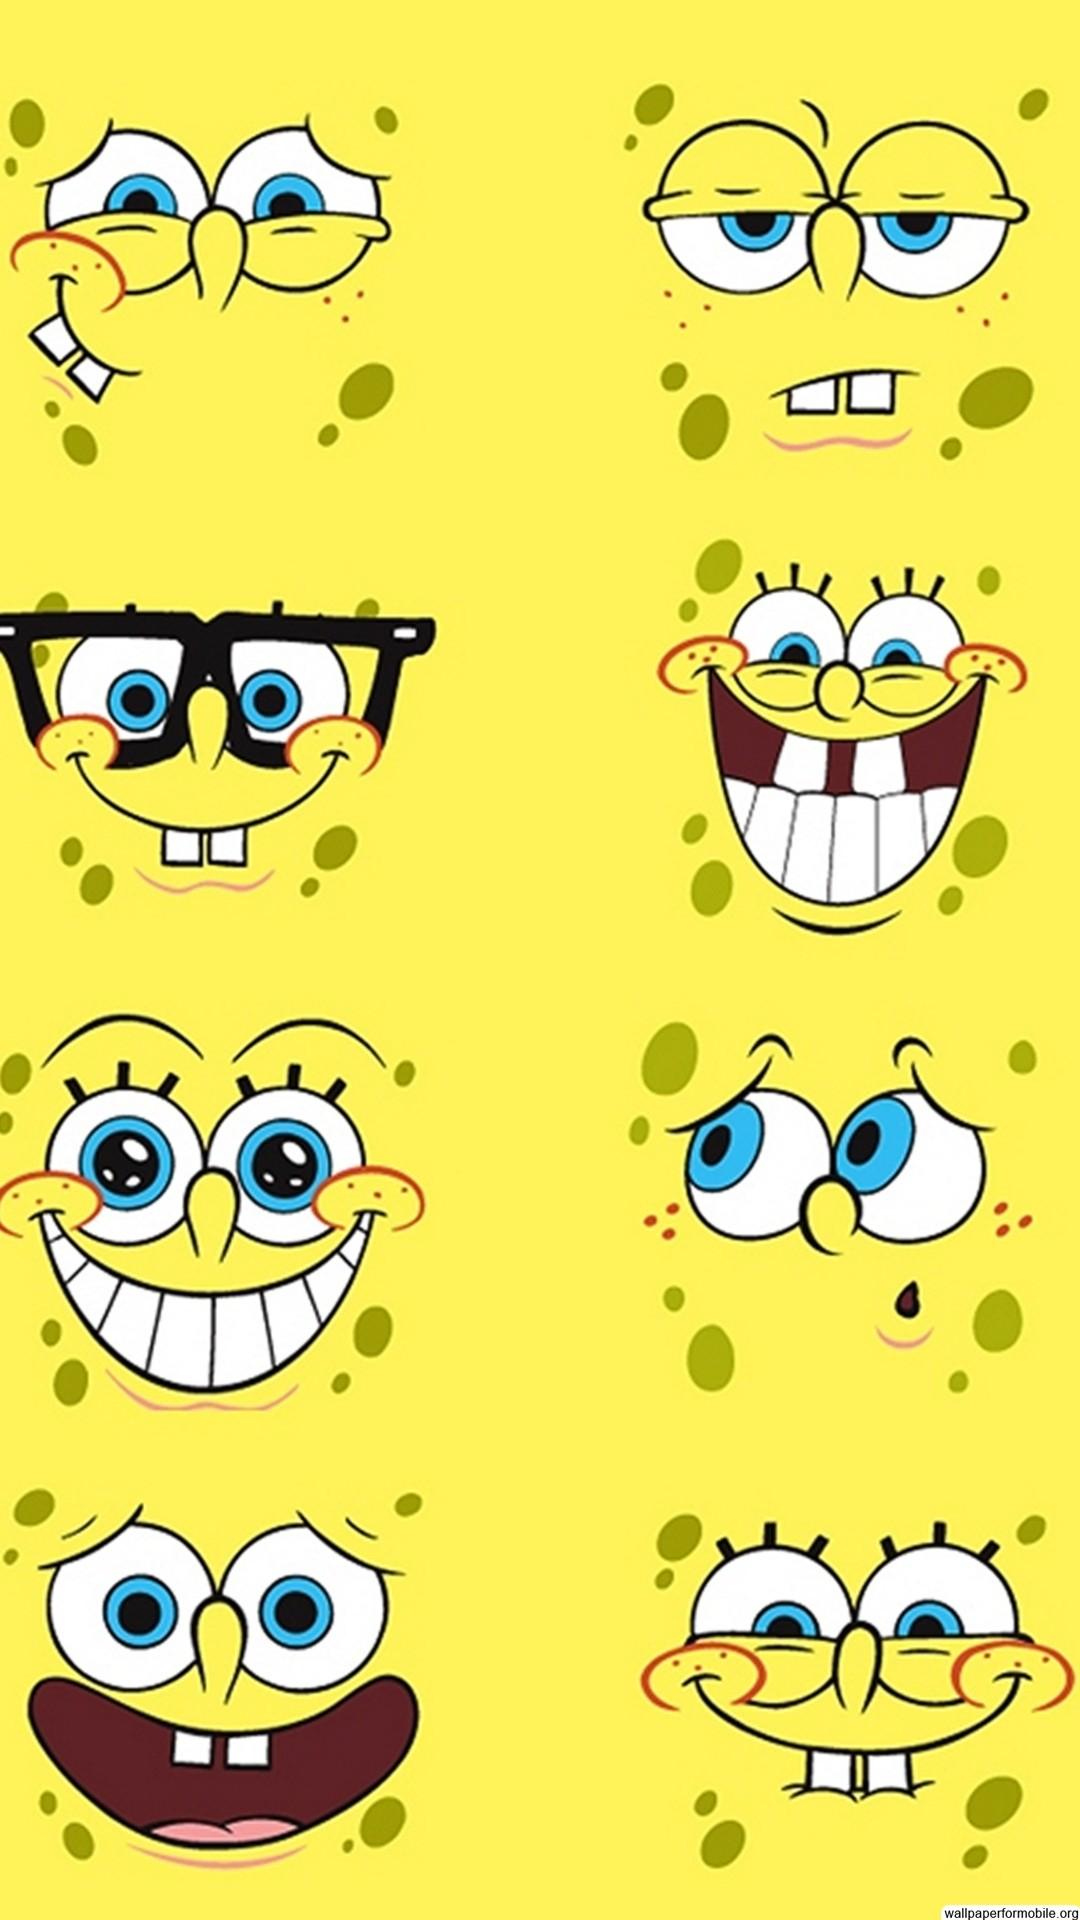 1920x1088 Spongebob Squarepants Patrick Wallpaper. Download